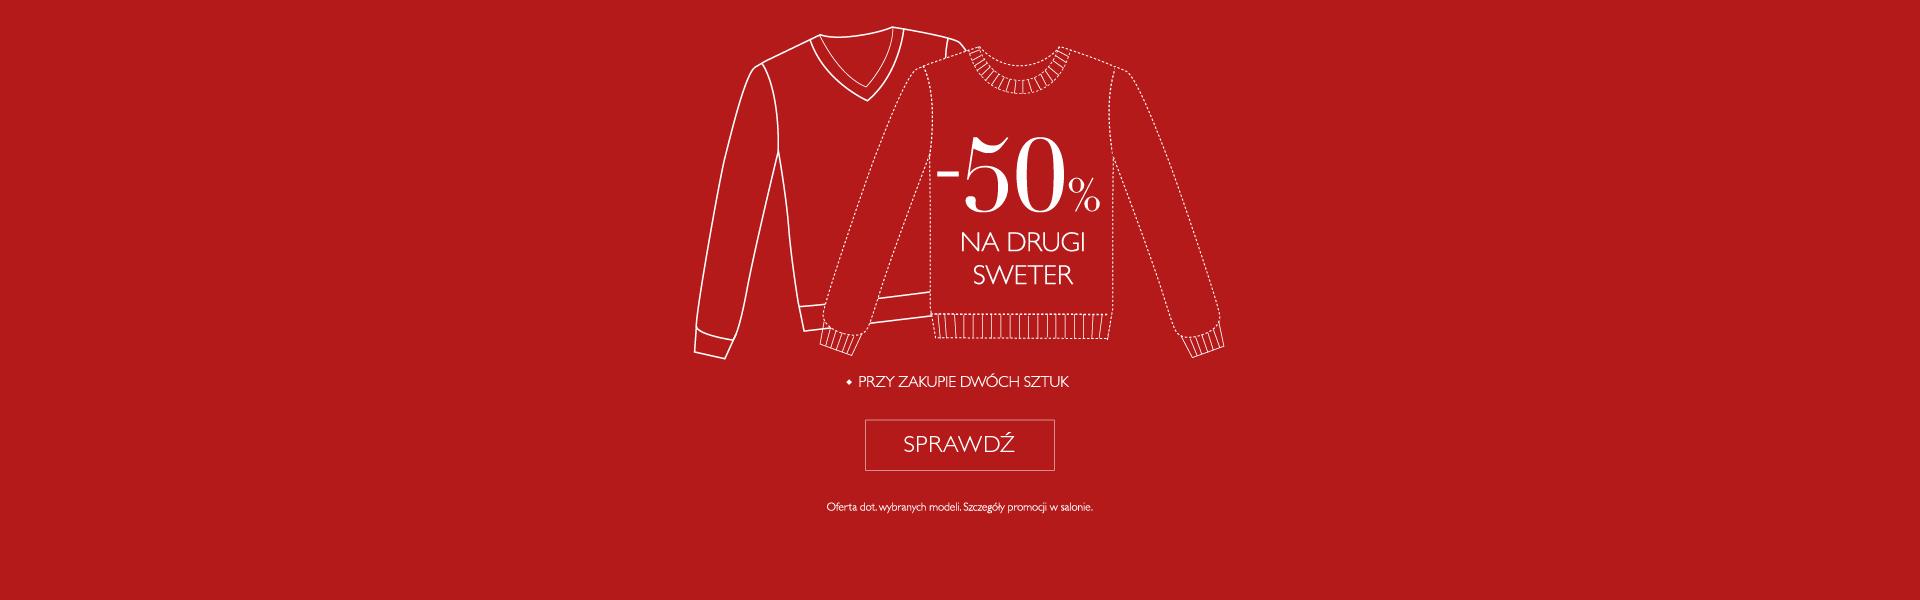 Swetry - promocja